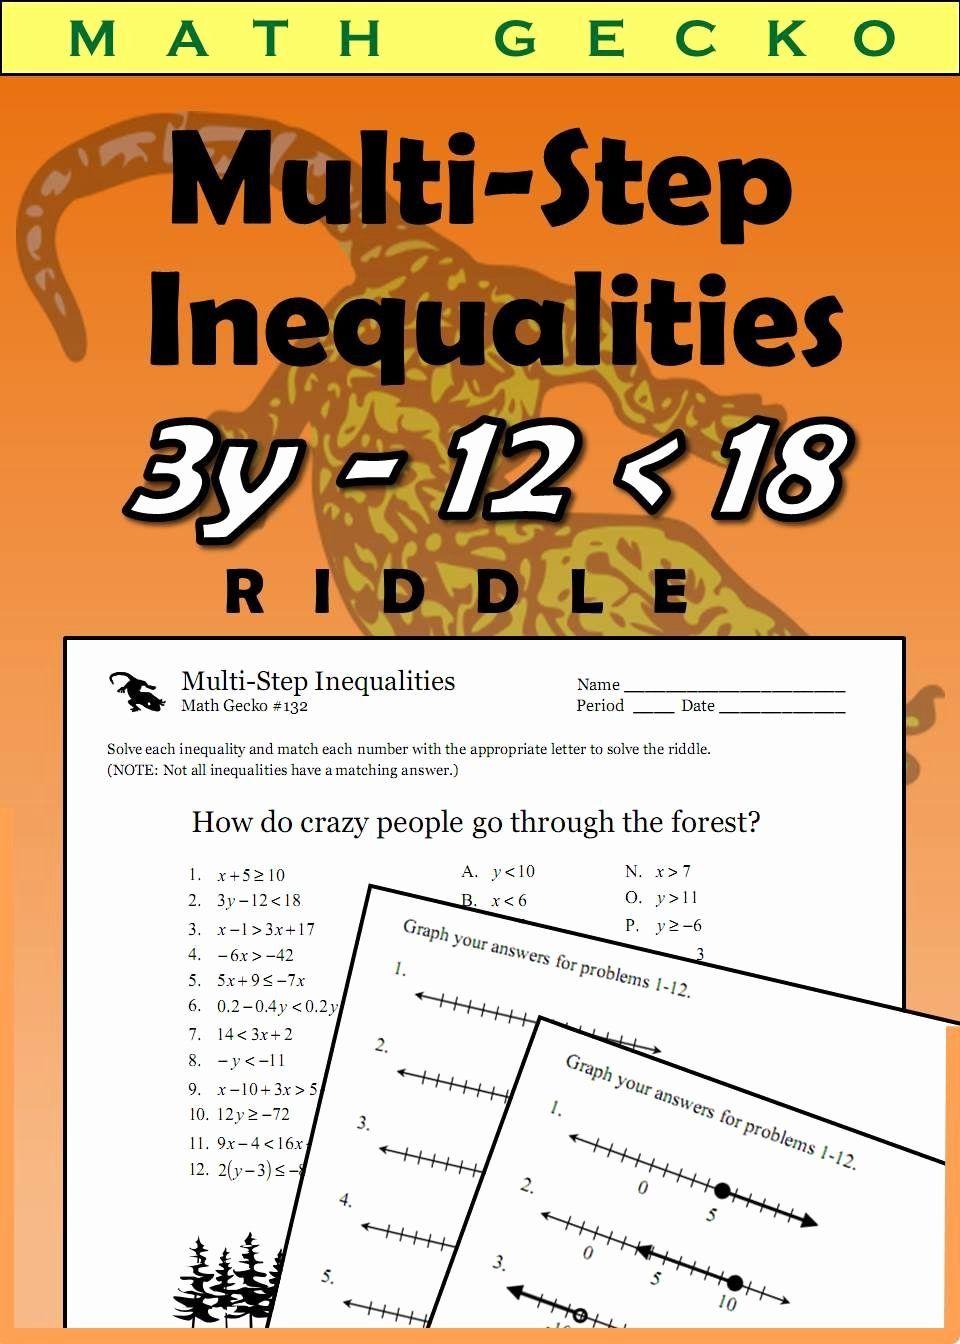 Multi Step Inequalities Worksheet Lovely 132 Multi Step Inequalities Riddle Math In 2020 Multi Step Inequalities Solving Inequalities Inequality